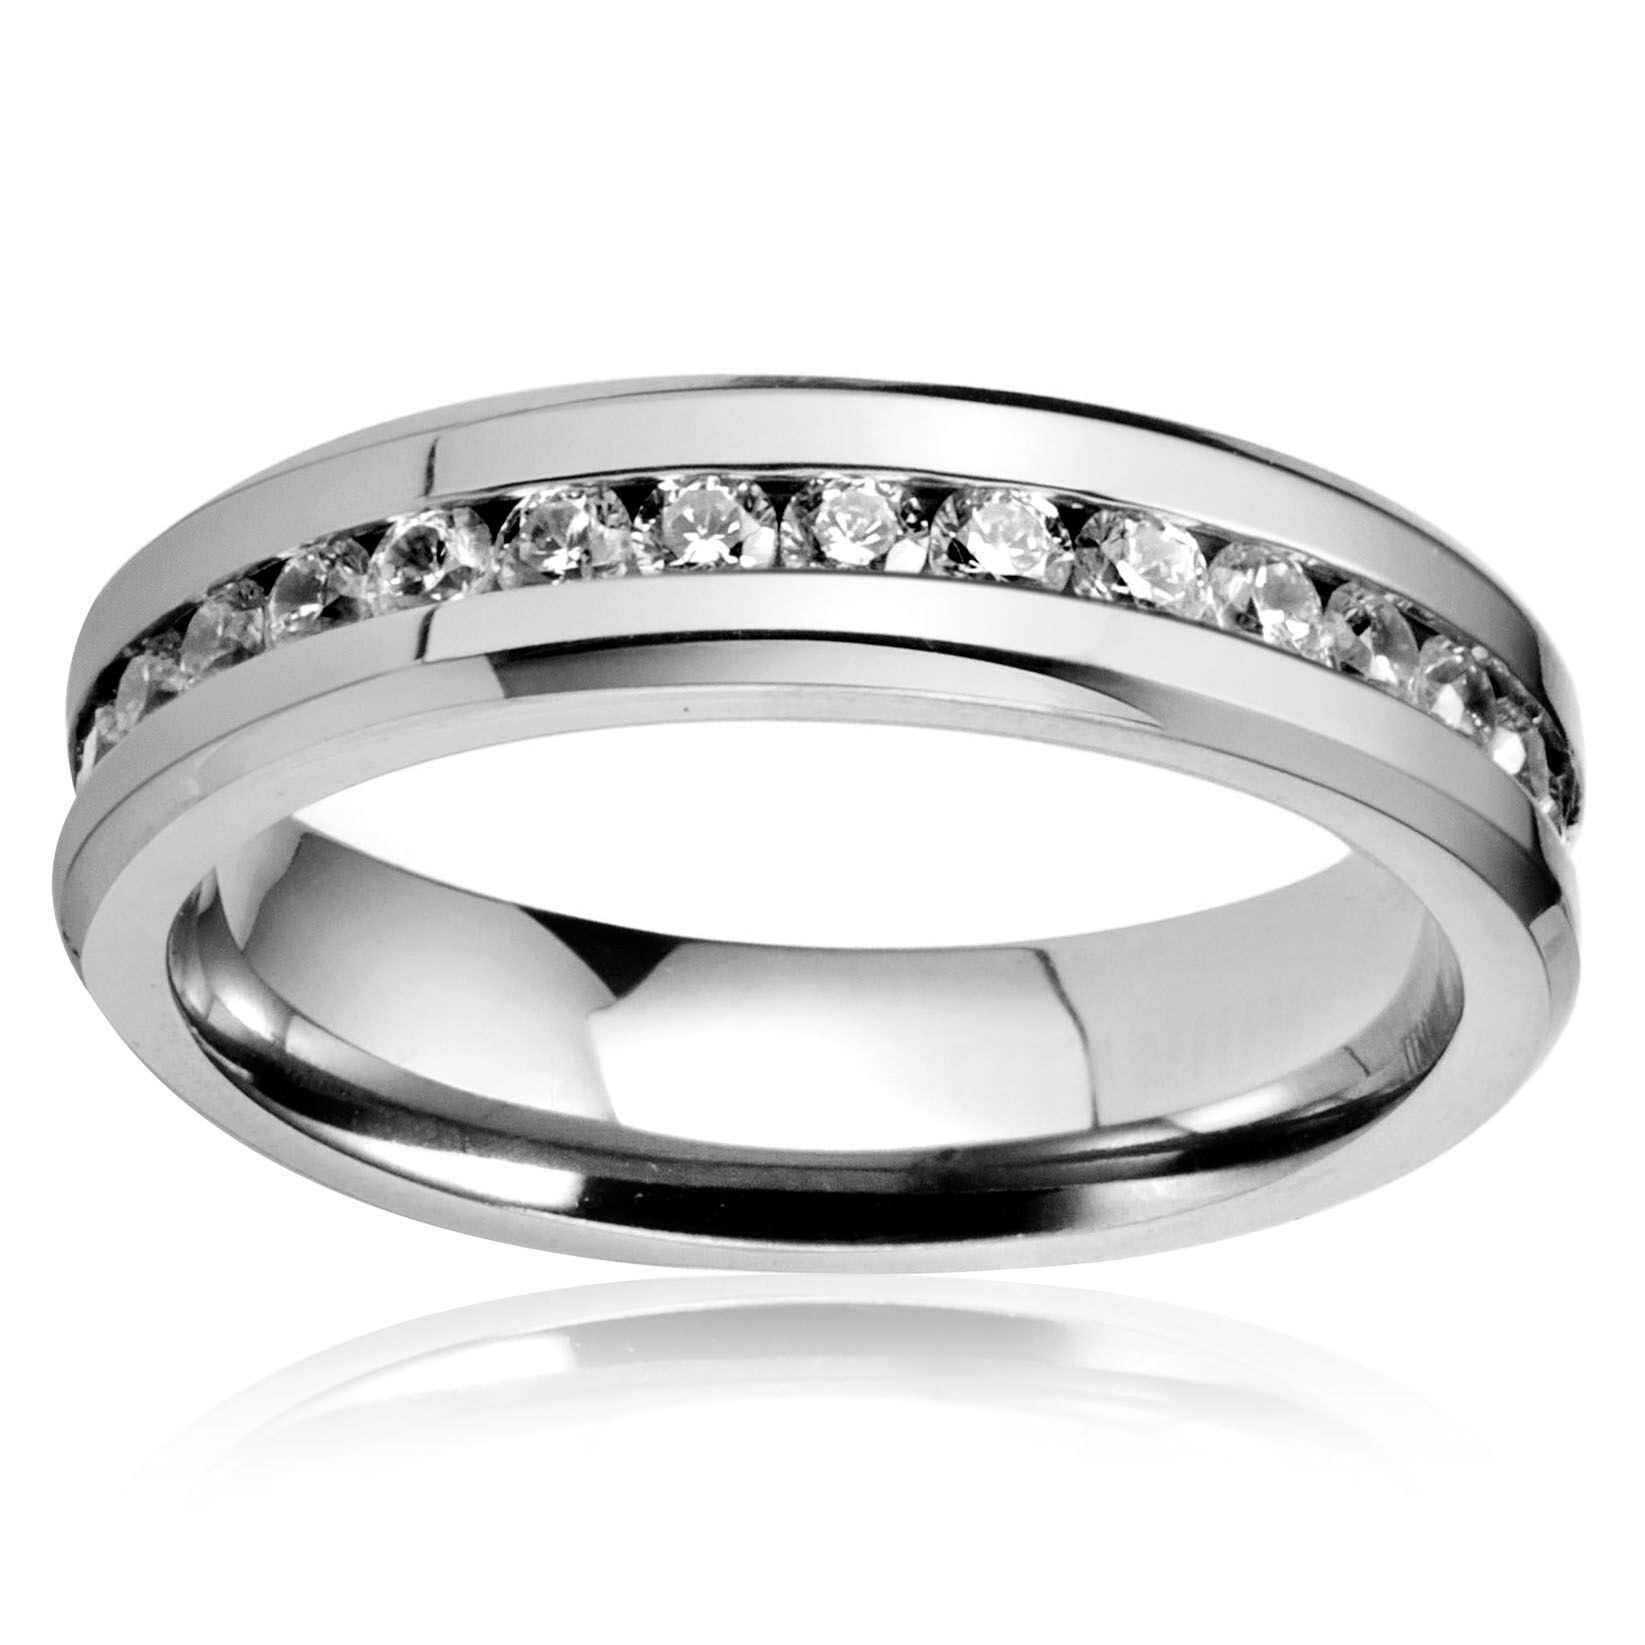 FIBO STEEL 6mm Mens Womens Titanium Ring Engagement